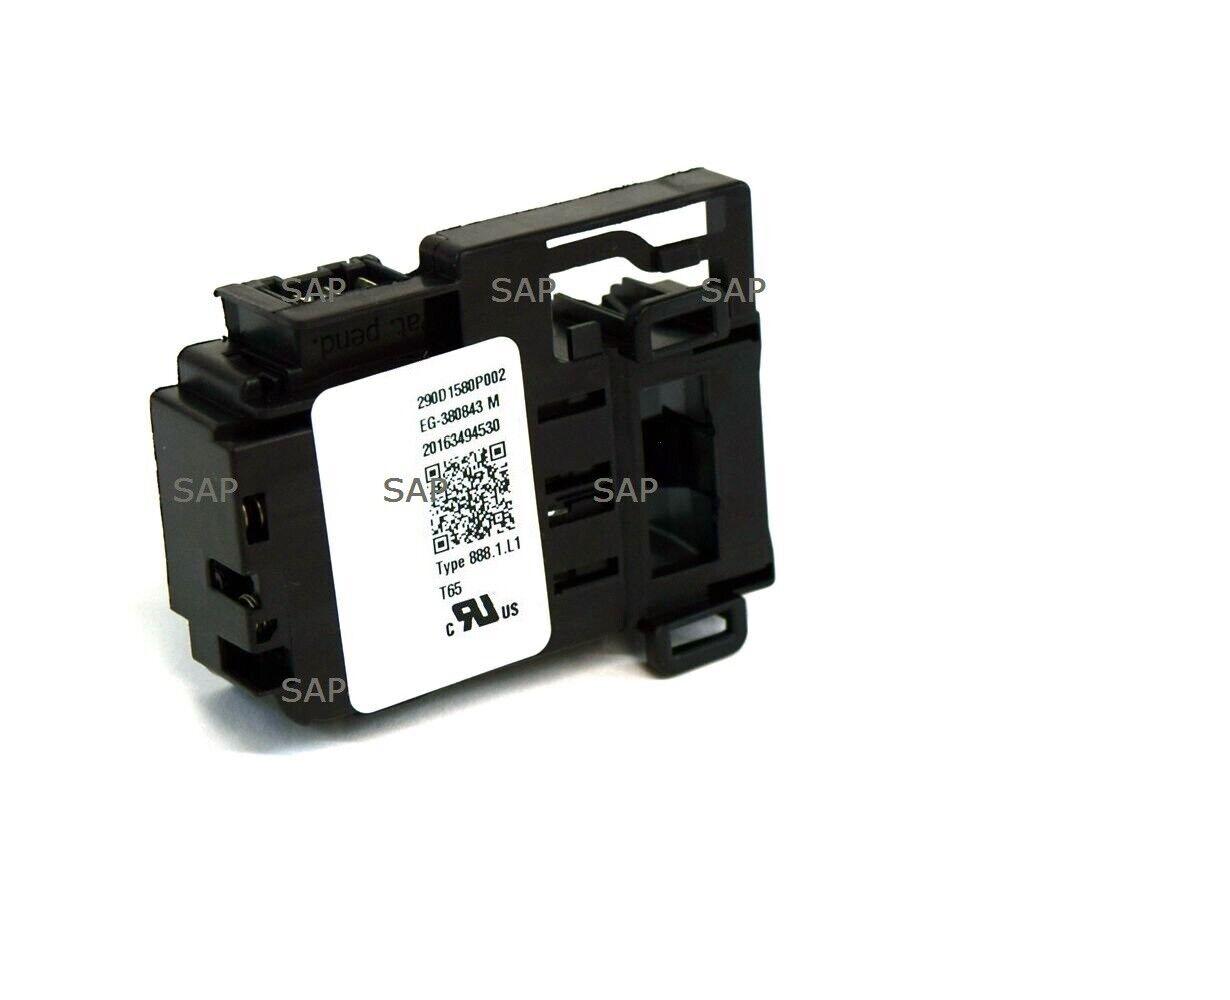 GE Lid Lock Switch Assembly WH01X27954 WH01X26114 WH01X24114 290D1580P004